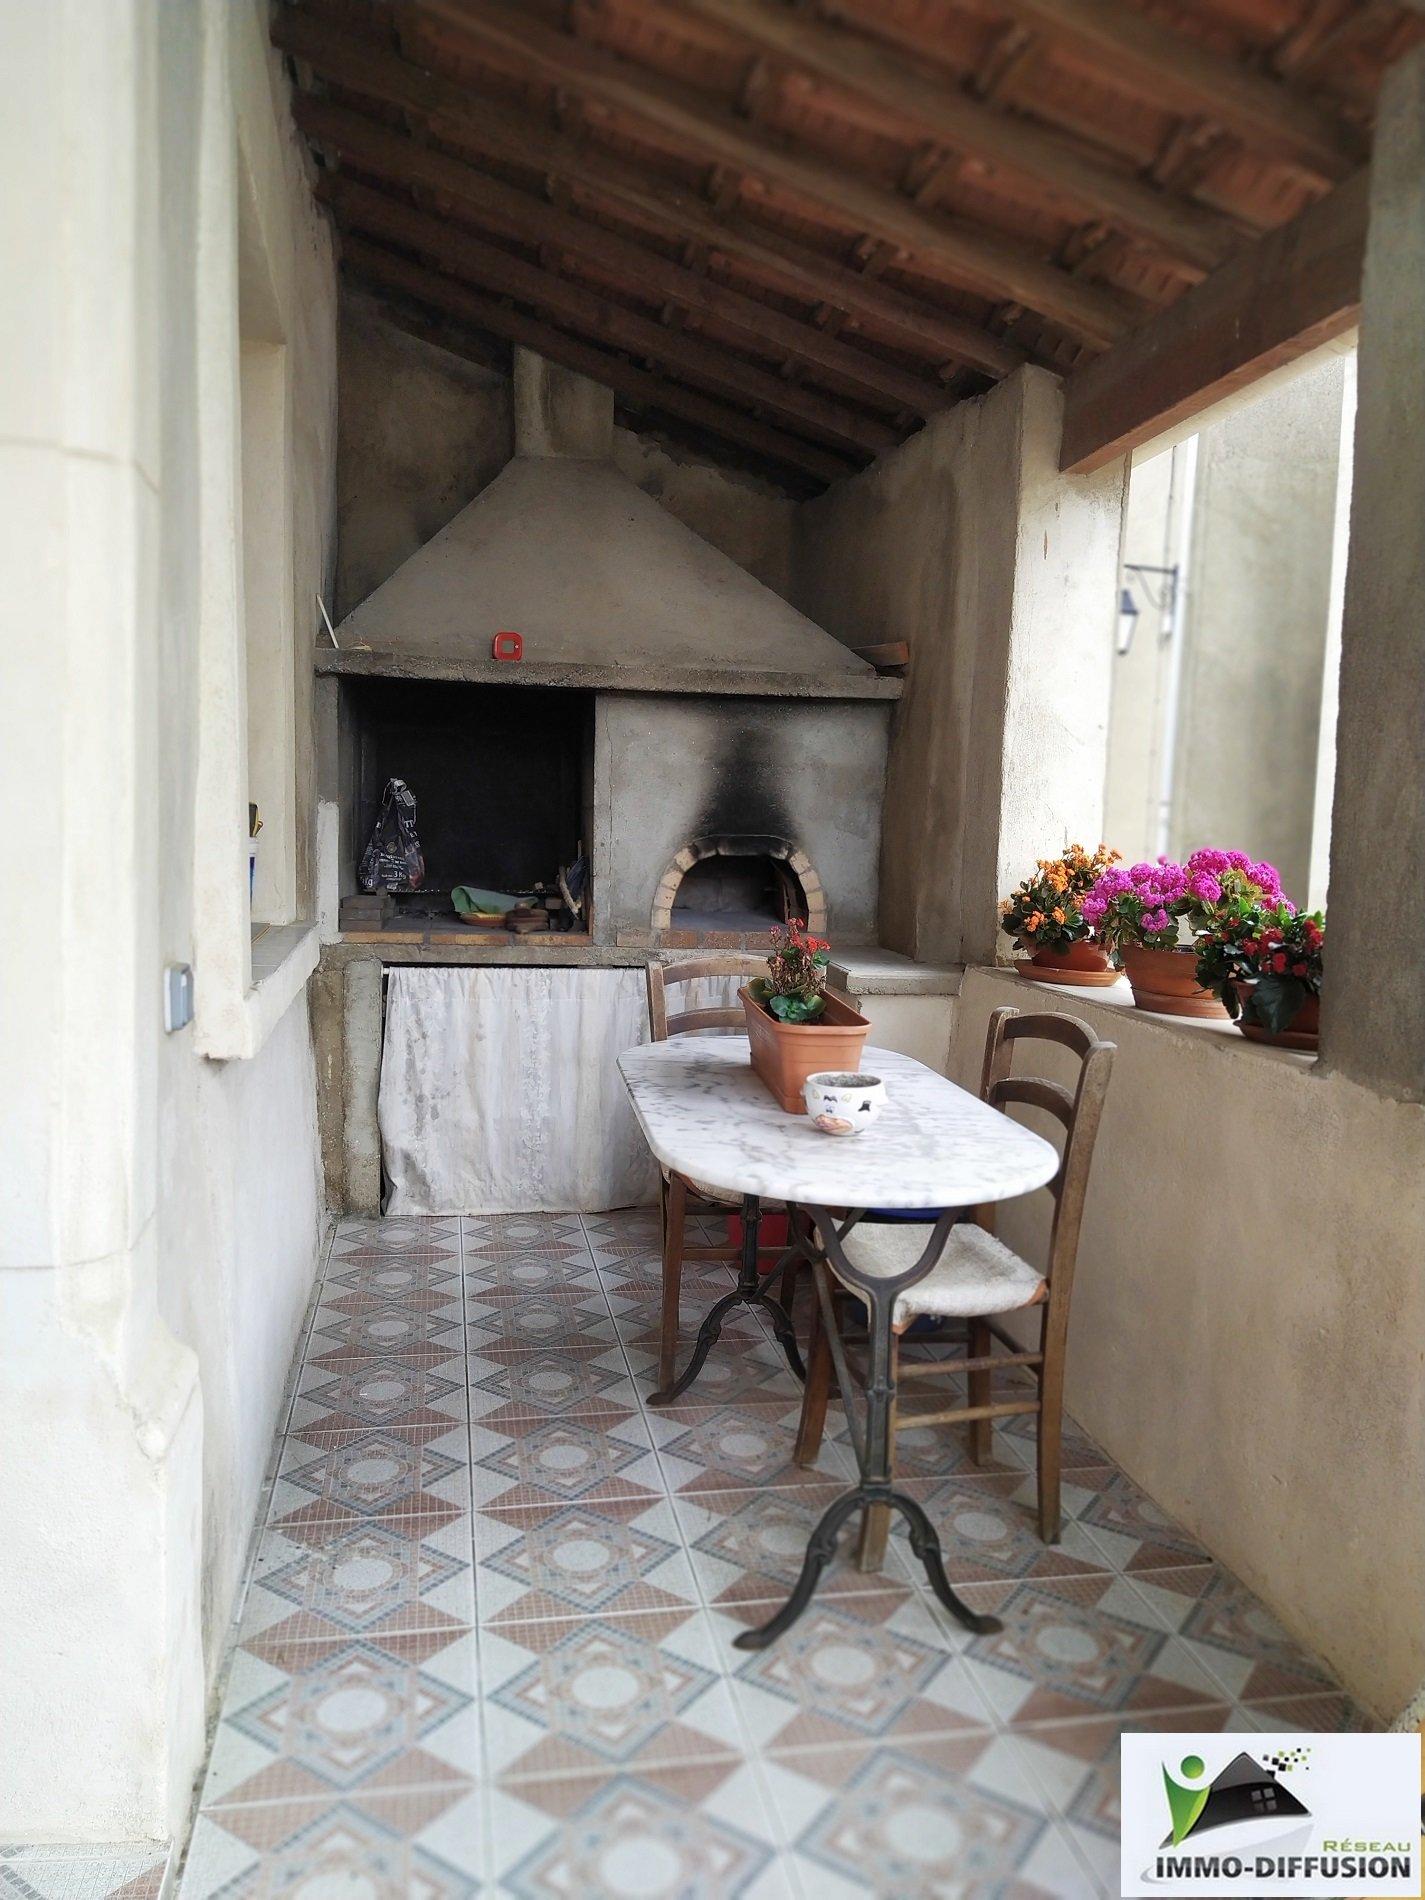 Village house with a garage